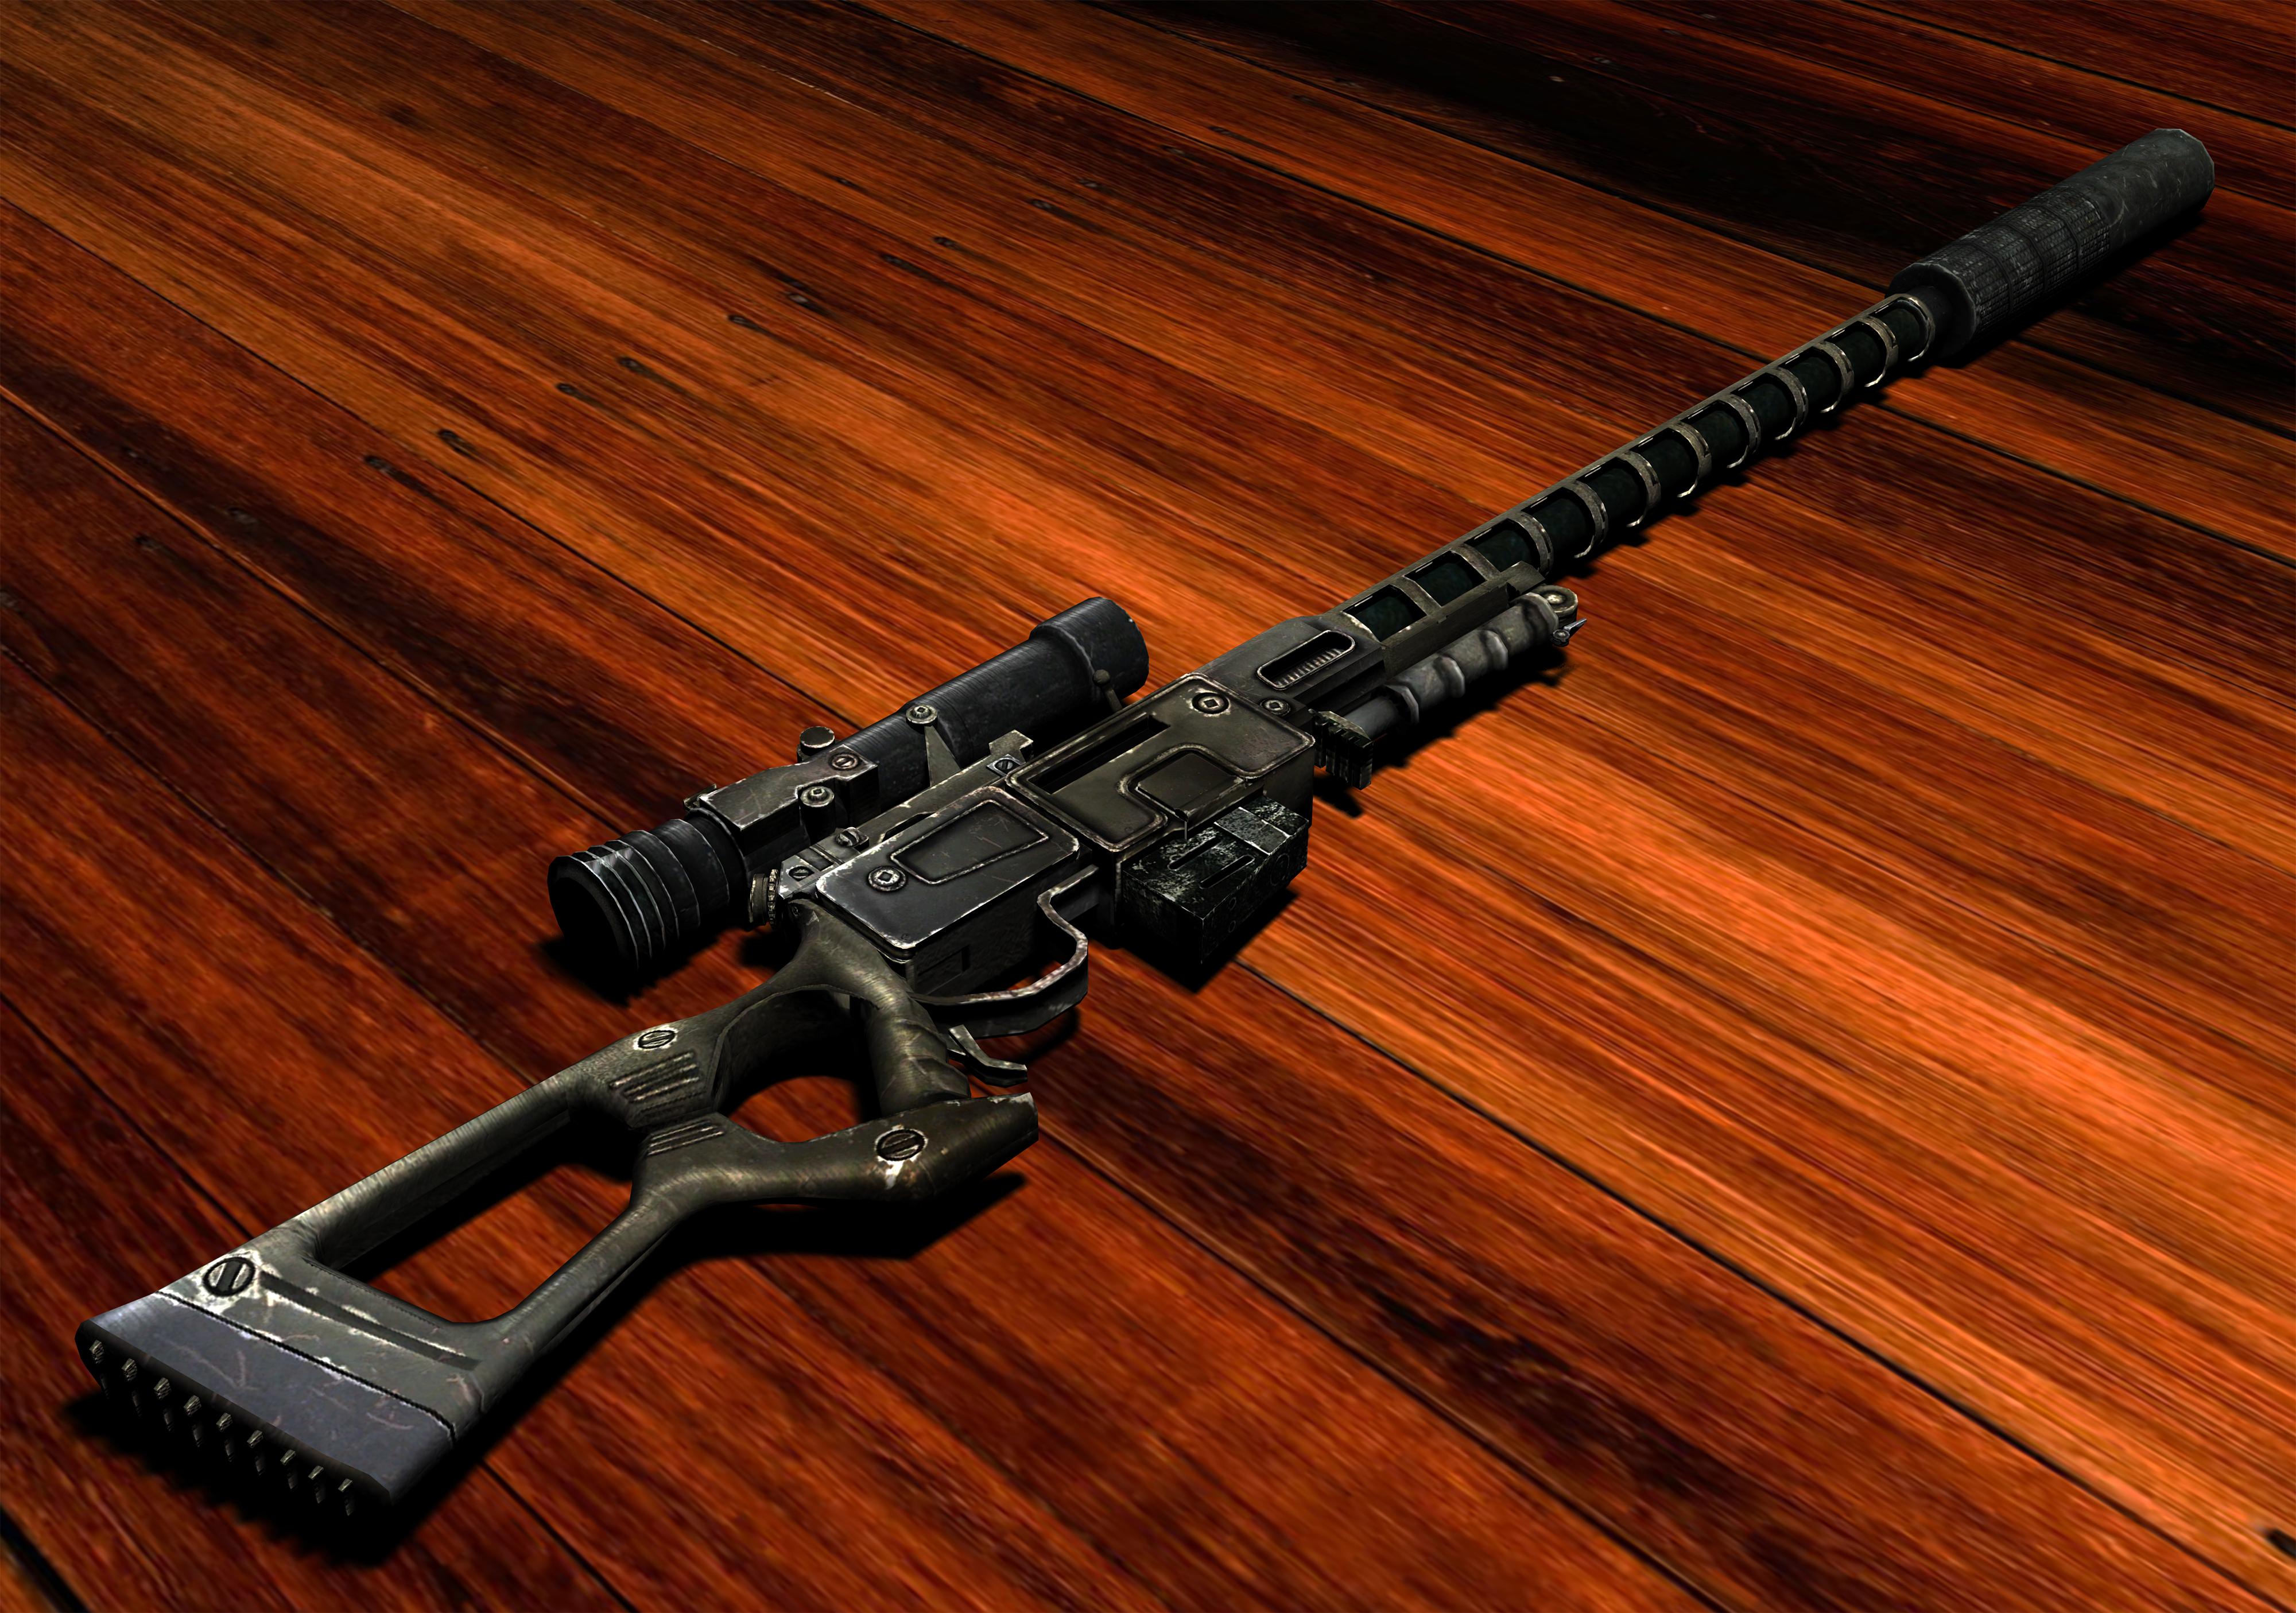 Sniper_rifle_02.jpg